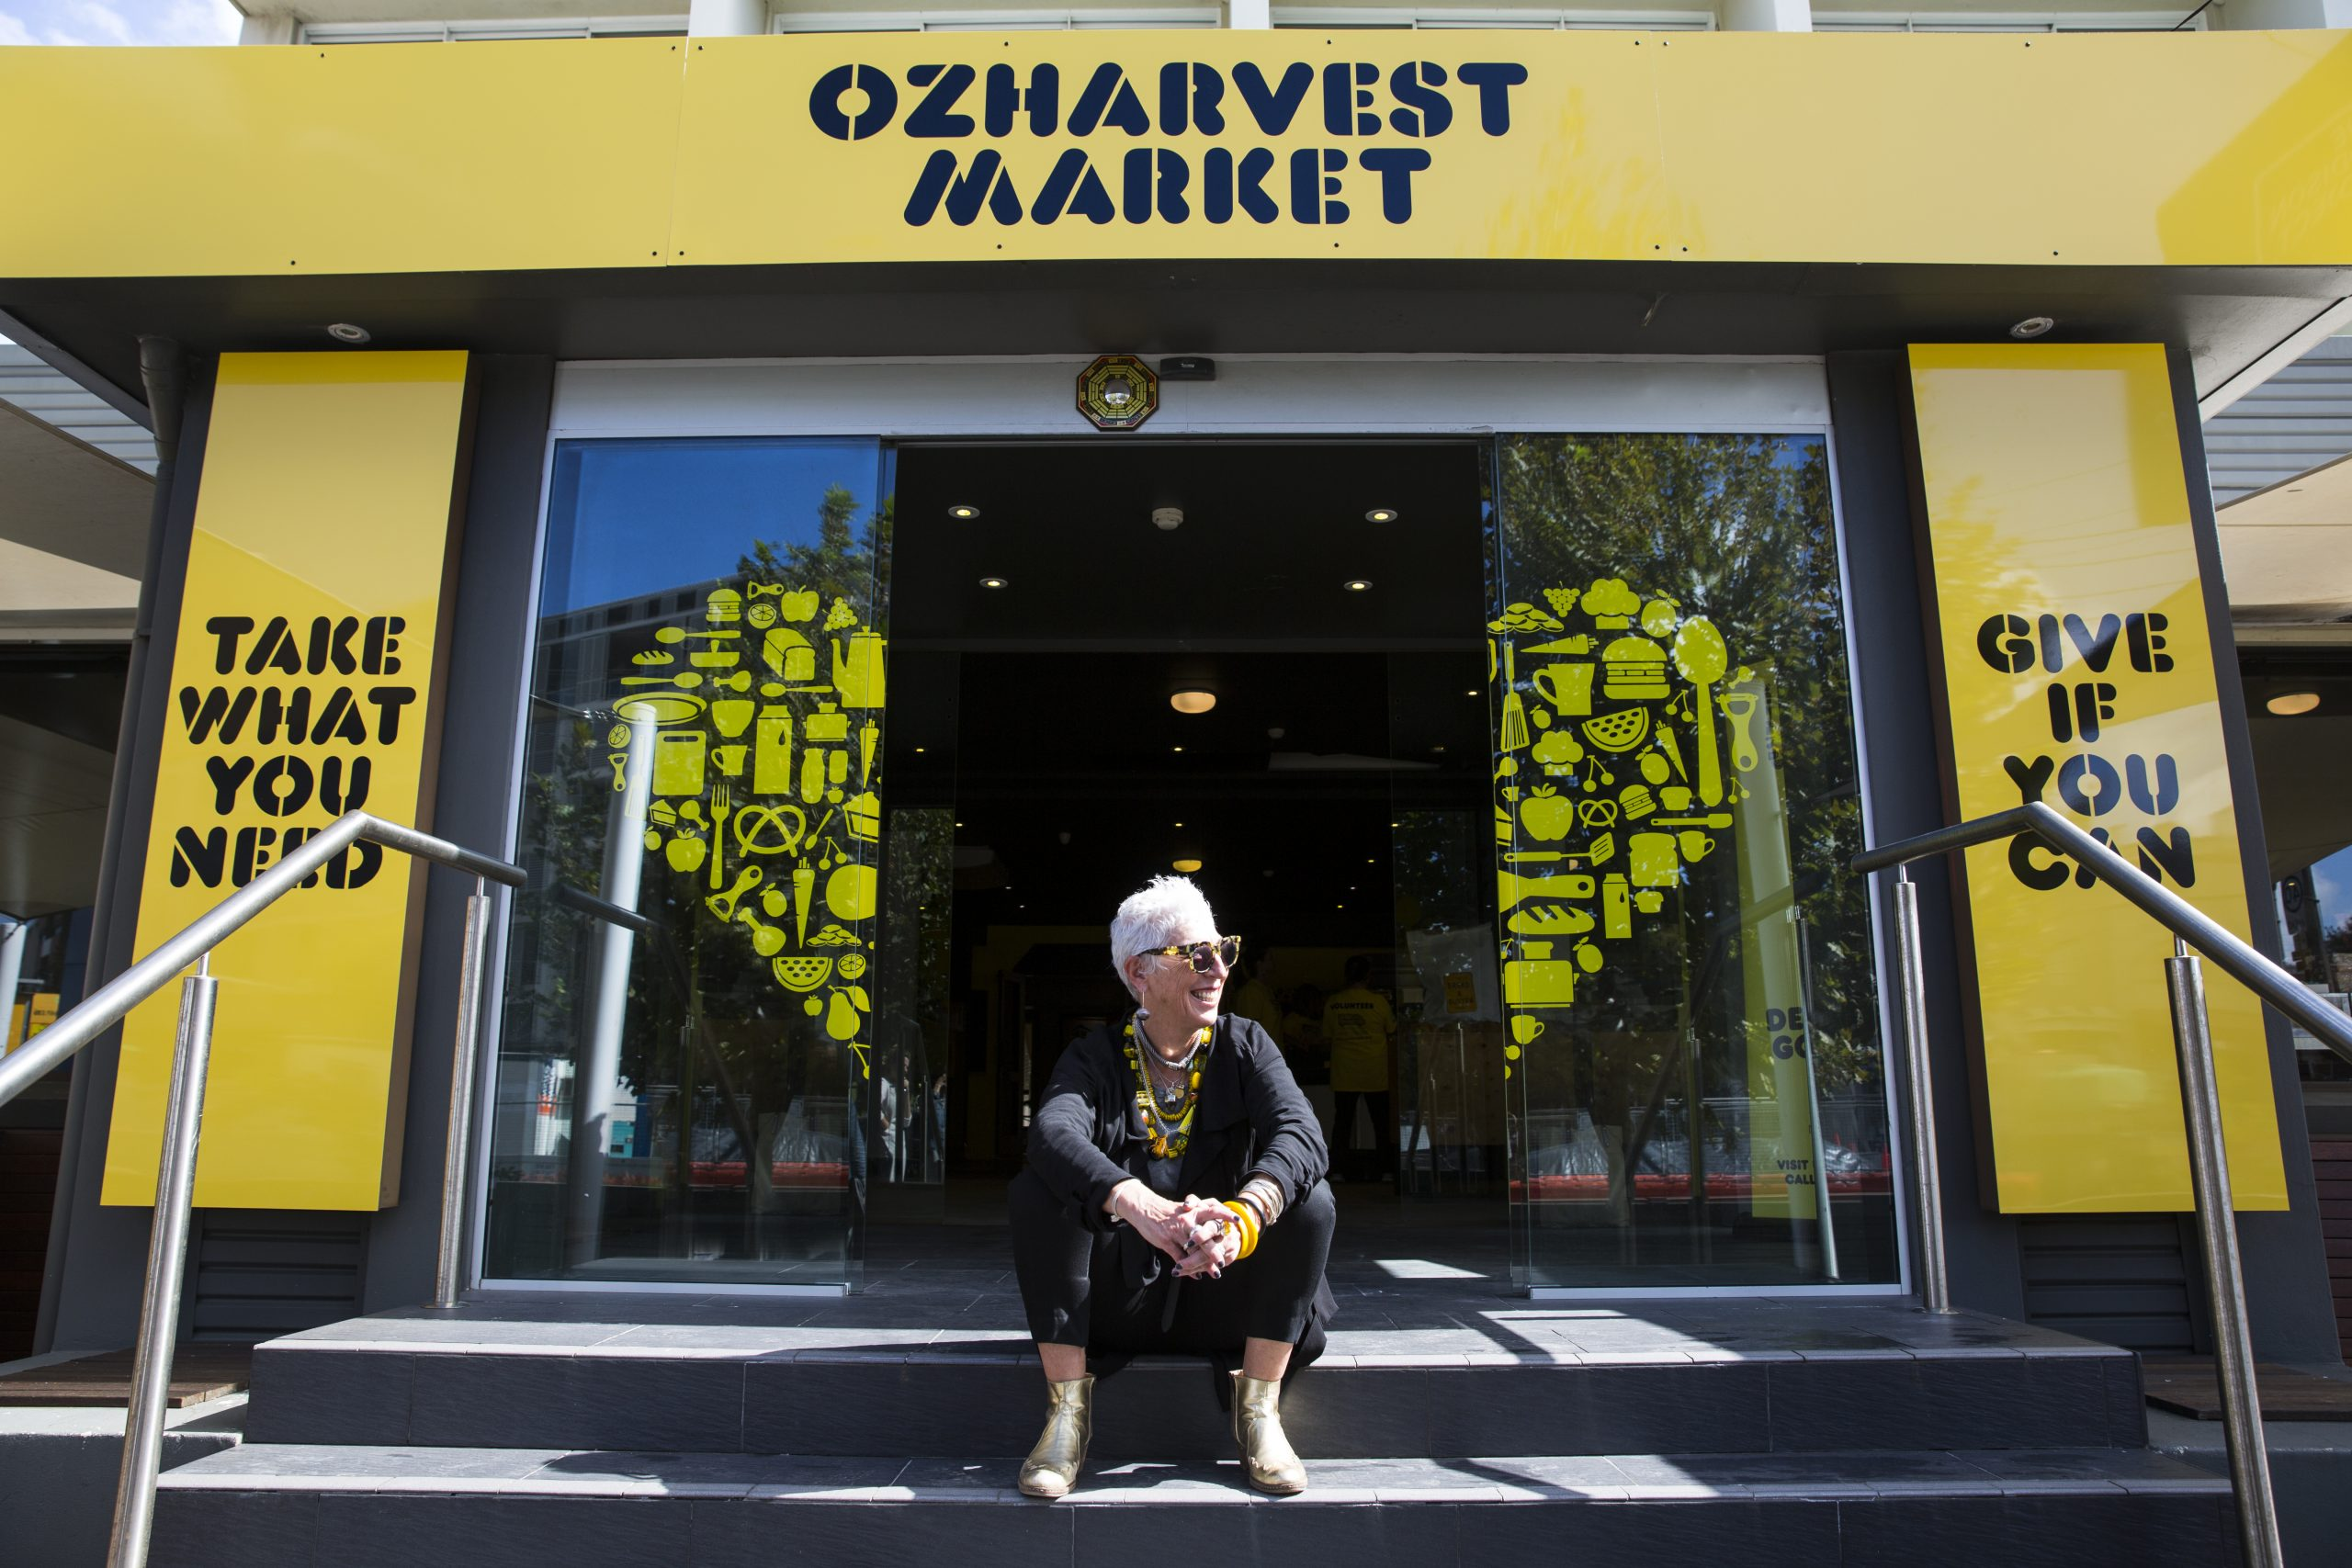 Ronni Kahn OzHarvest Market